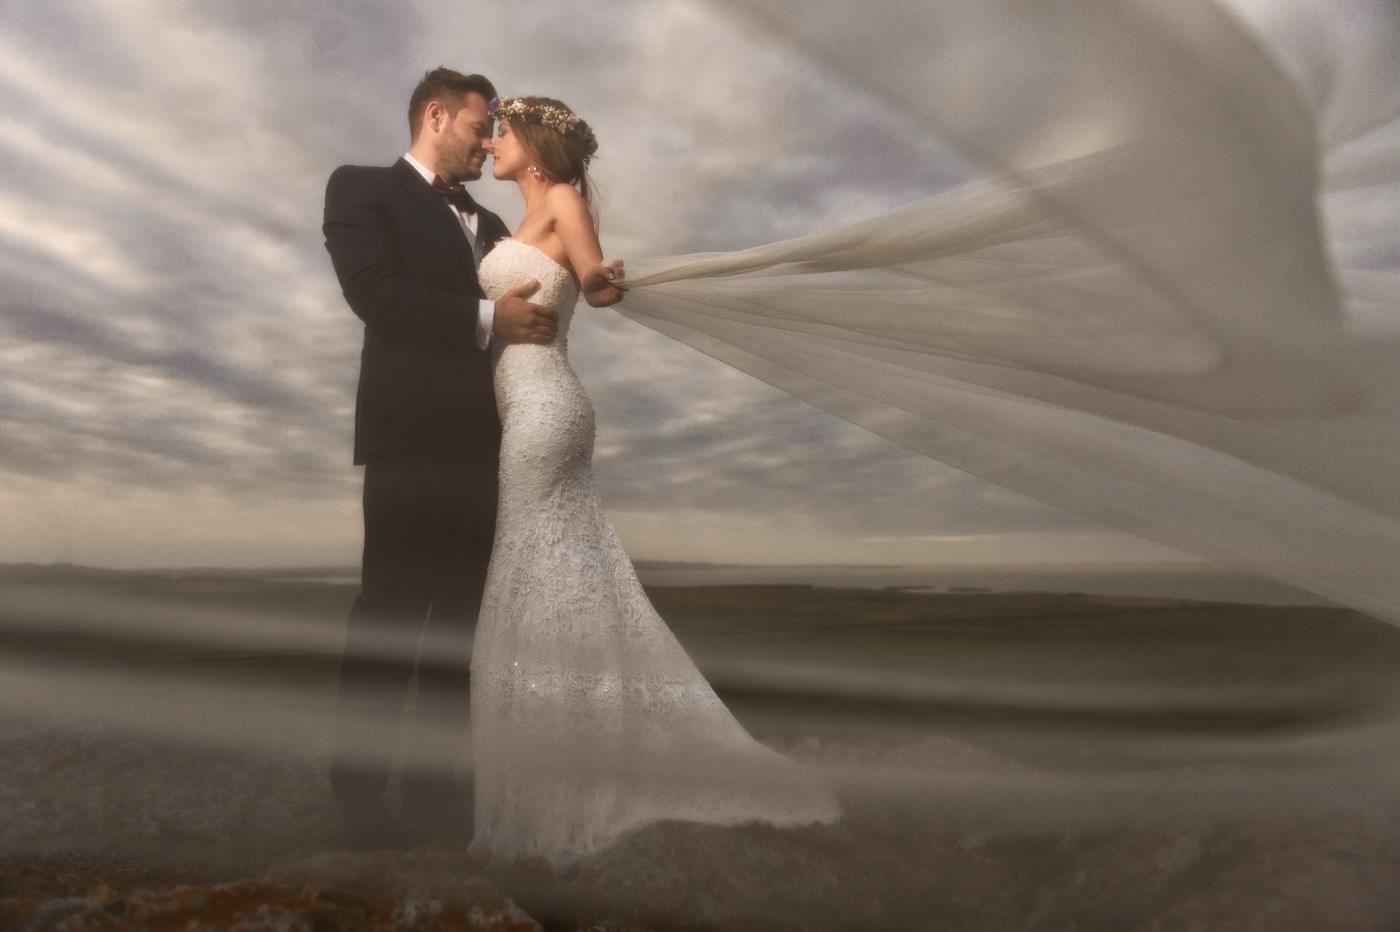 Destination Wedding Photographer_Marian Sterea_032.jpg